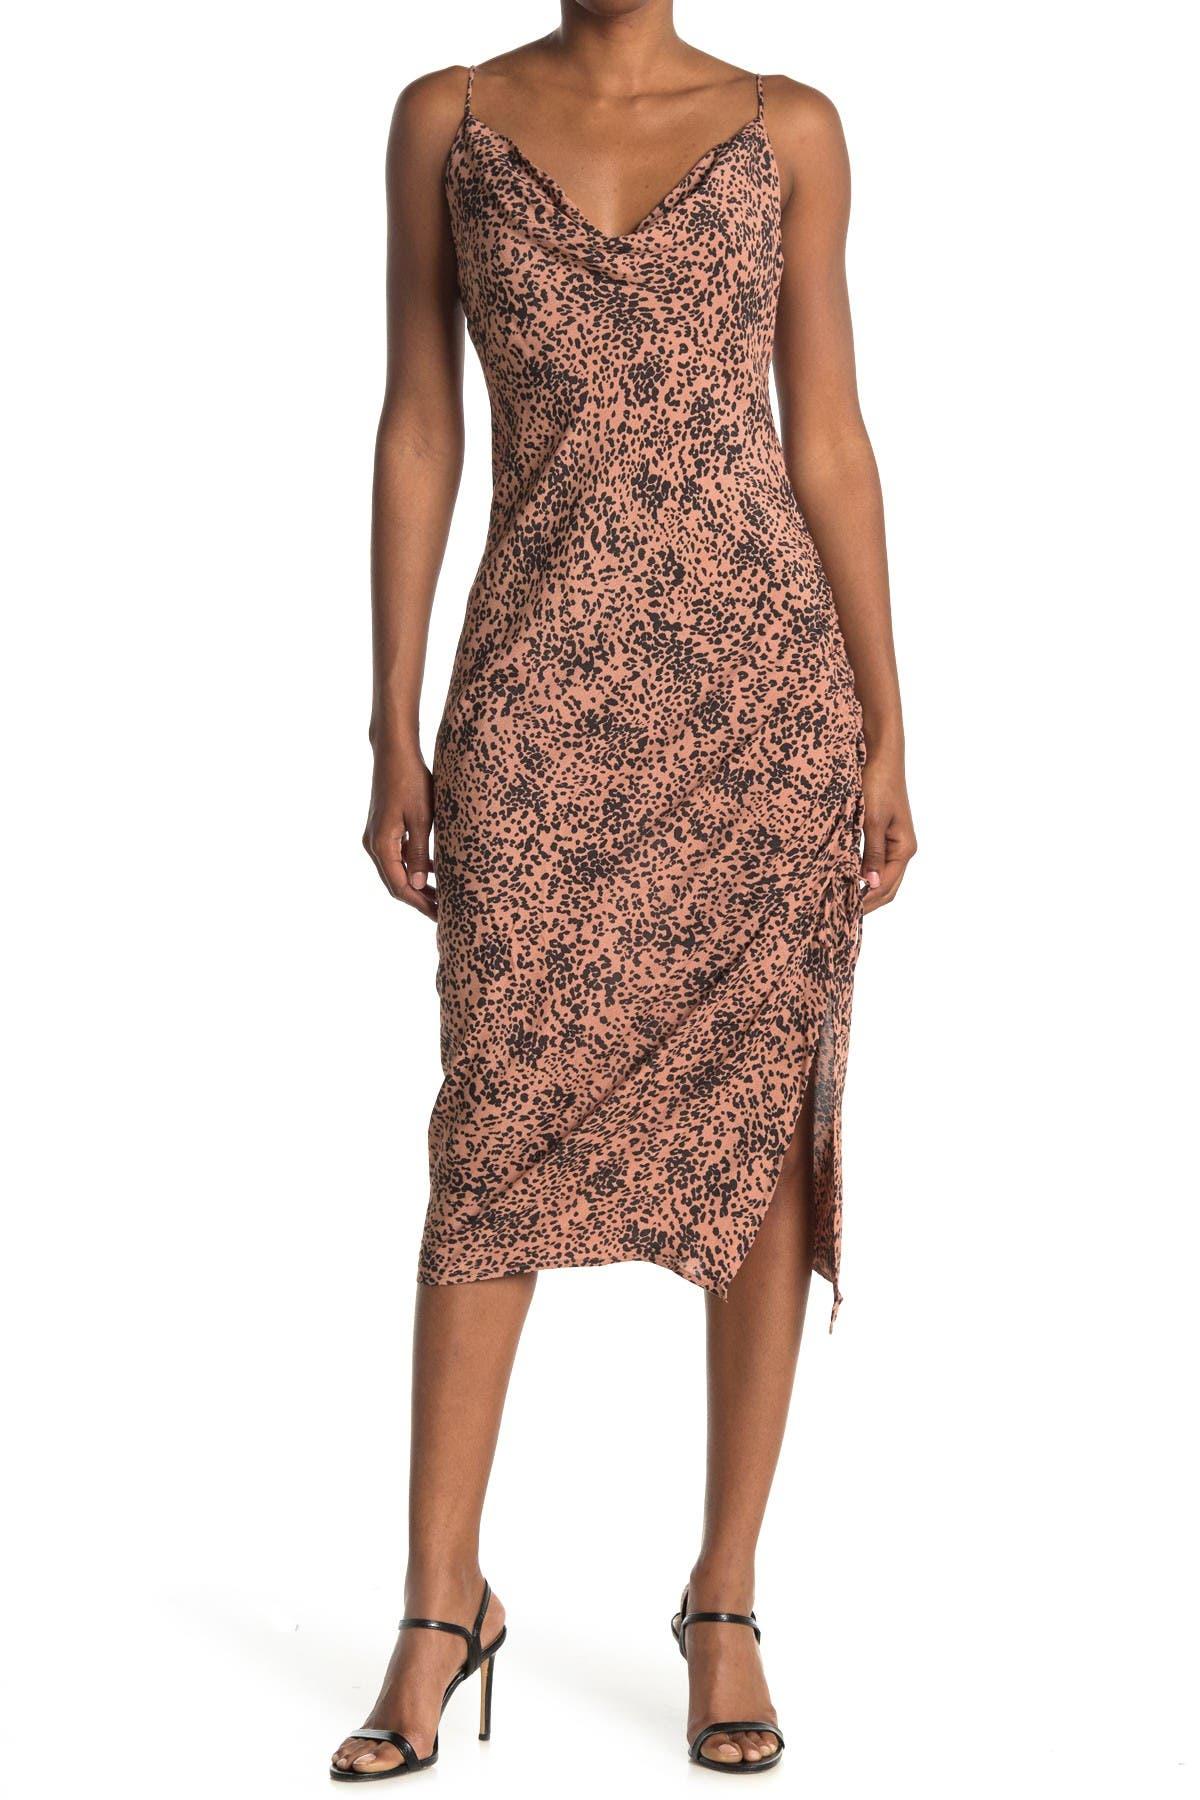 Image of Love Stitch Printed Ruche Sleeveless Slip Dress